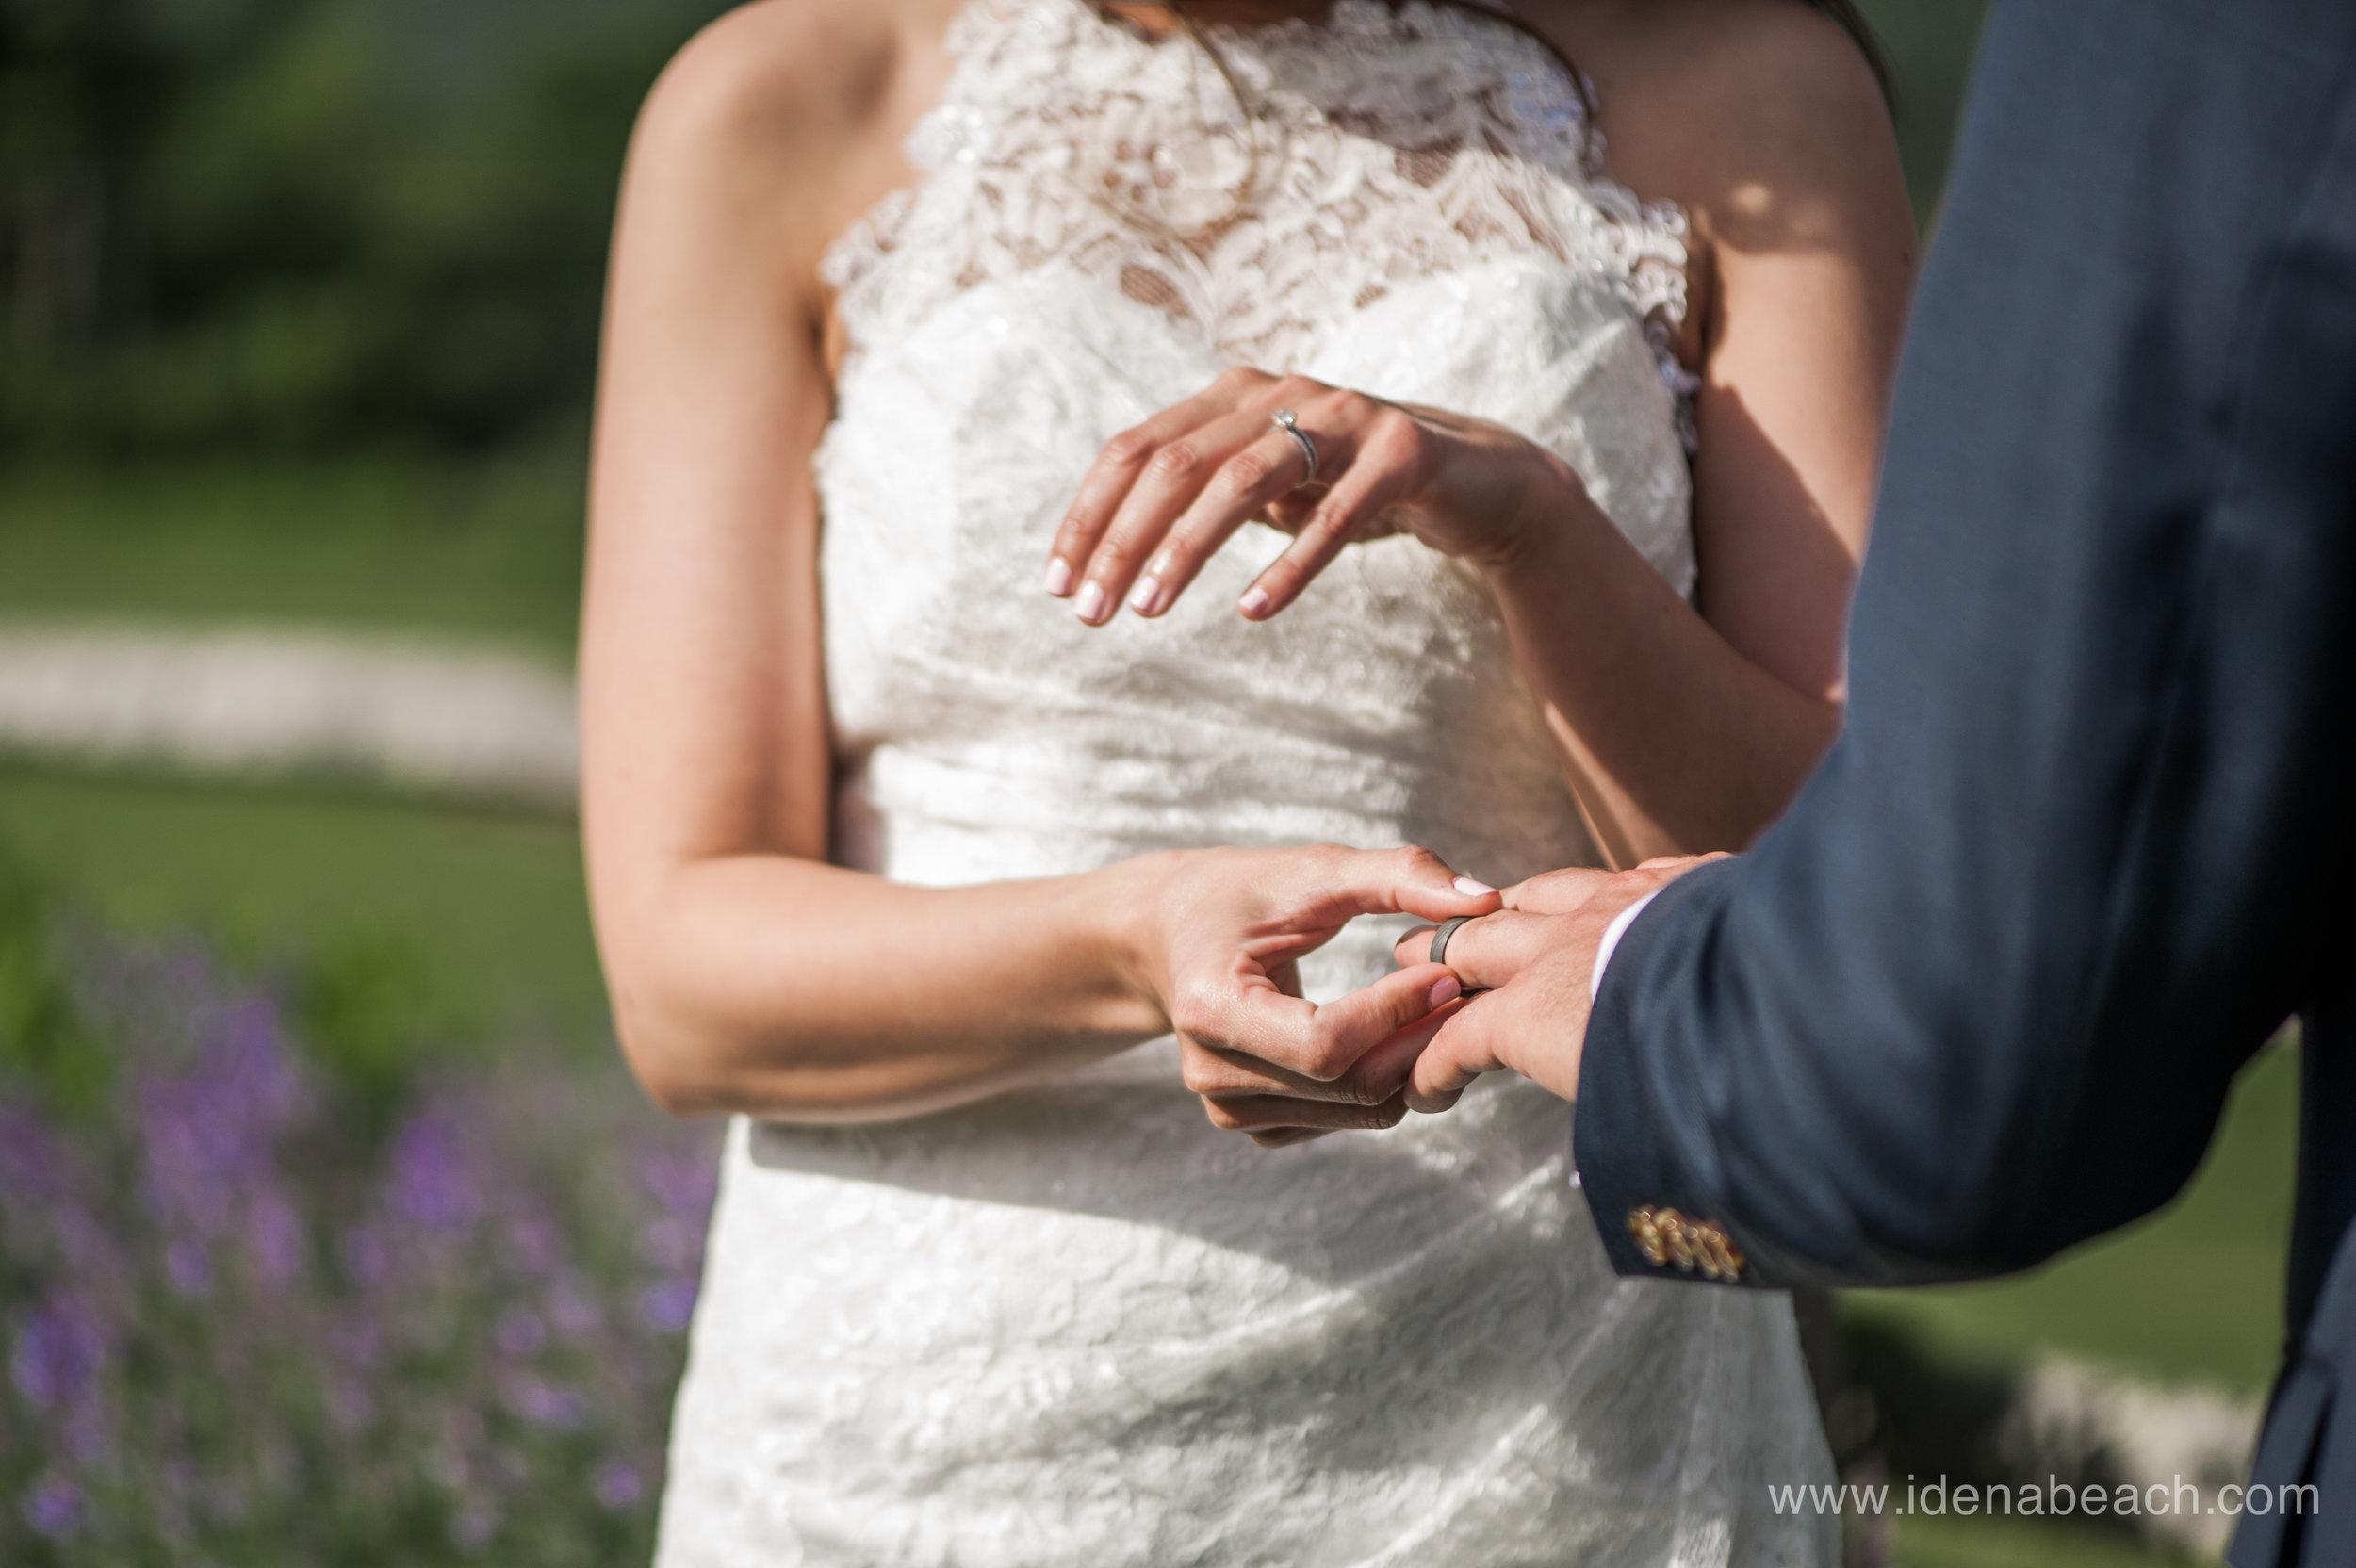 Mountain-Top-Inn-Vermont-Wedding-Photographer-59.jpg